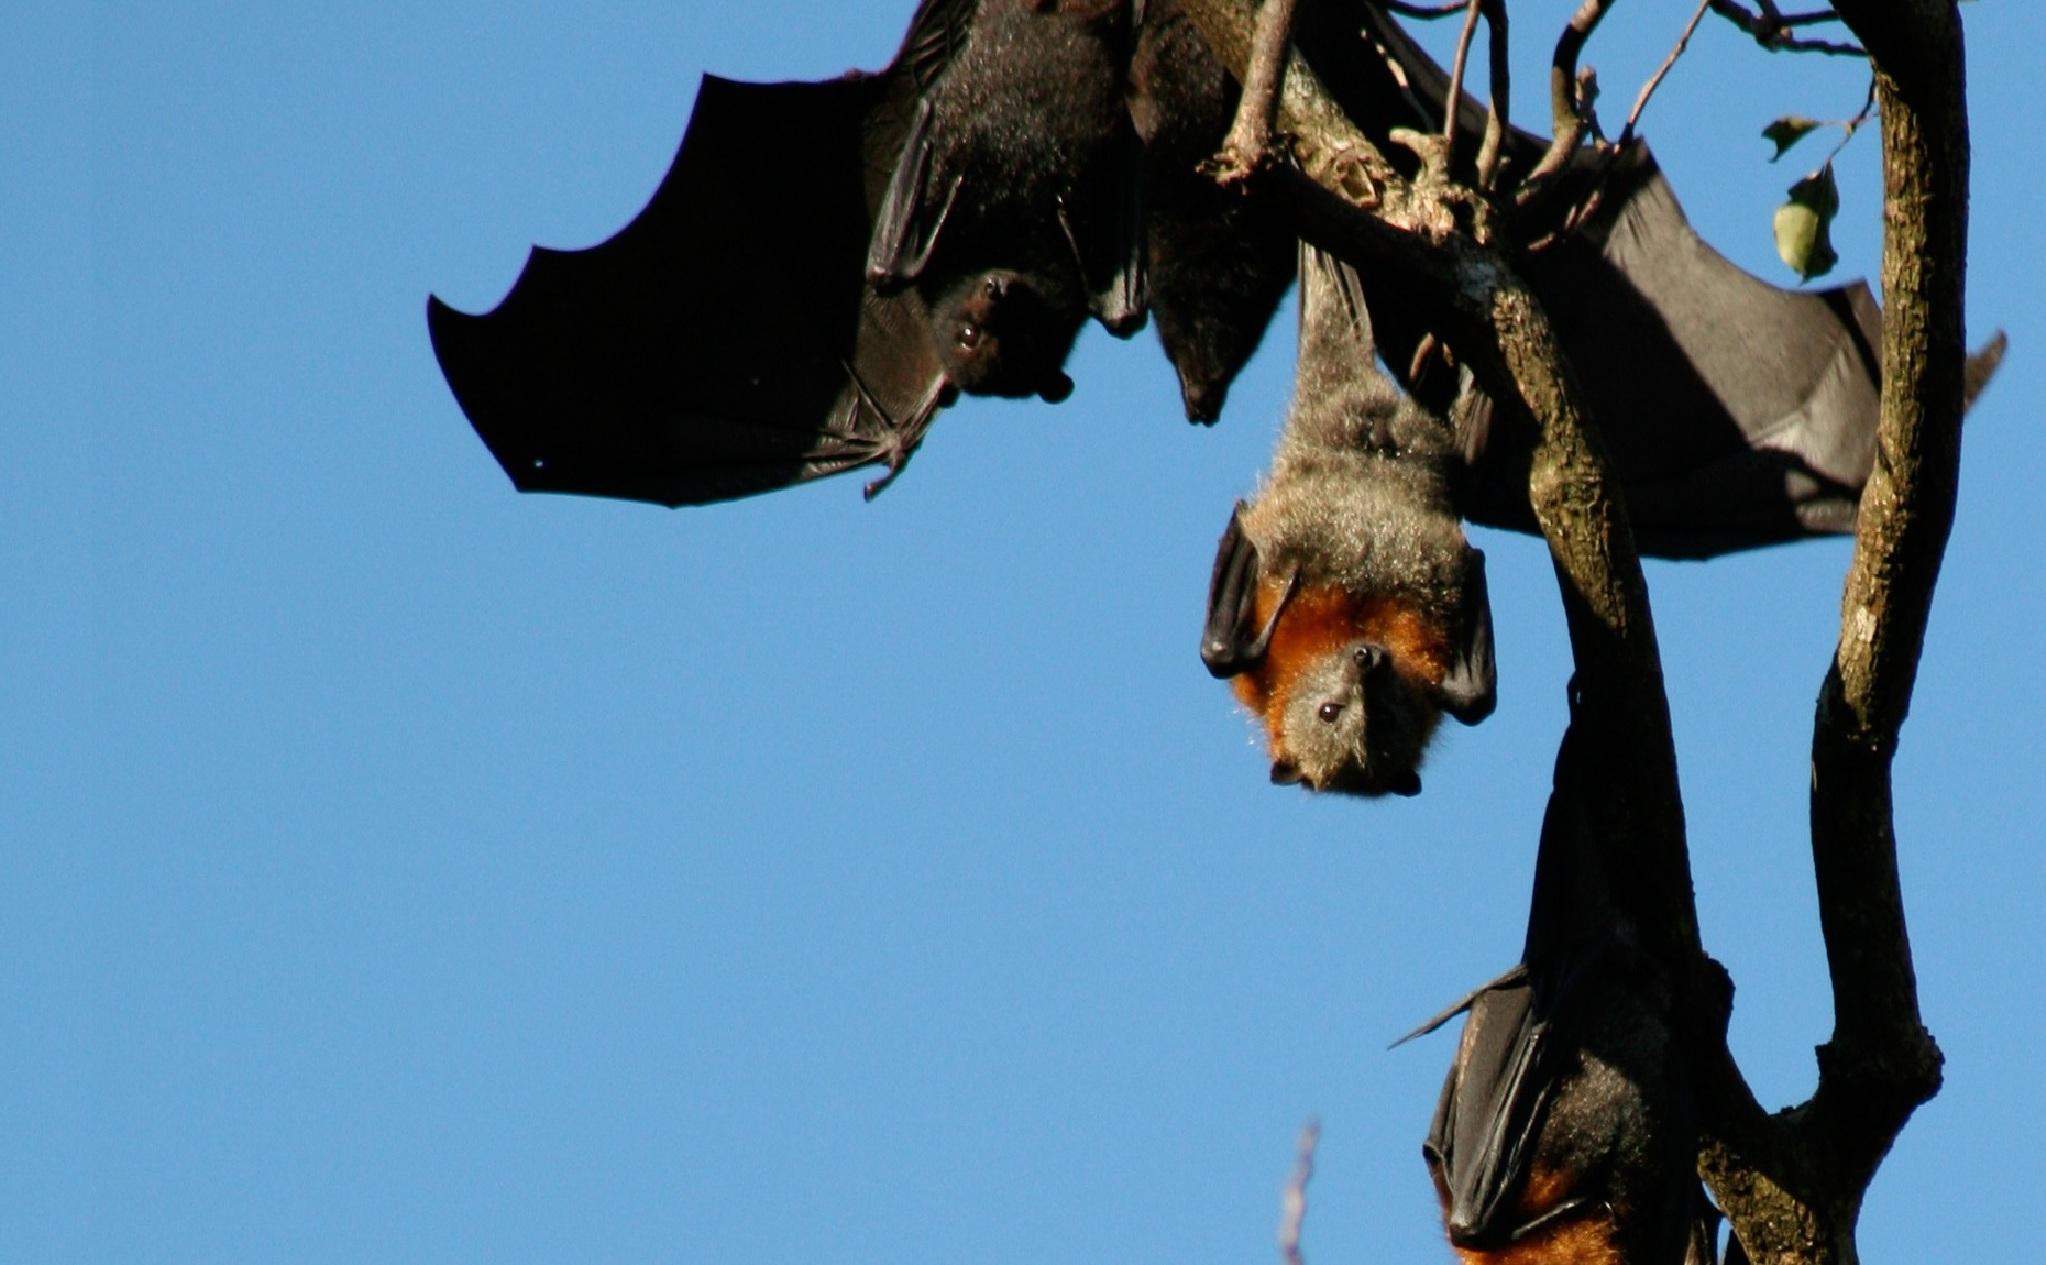 Murciélagos australianos. Imagen: M. Baker. Fuente: Csiro.